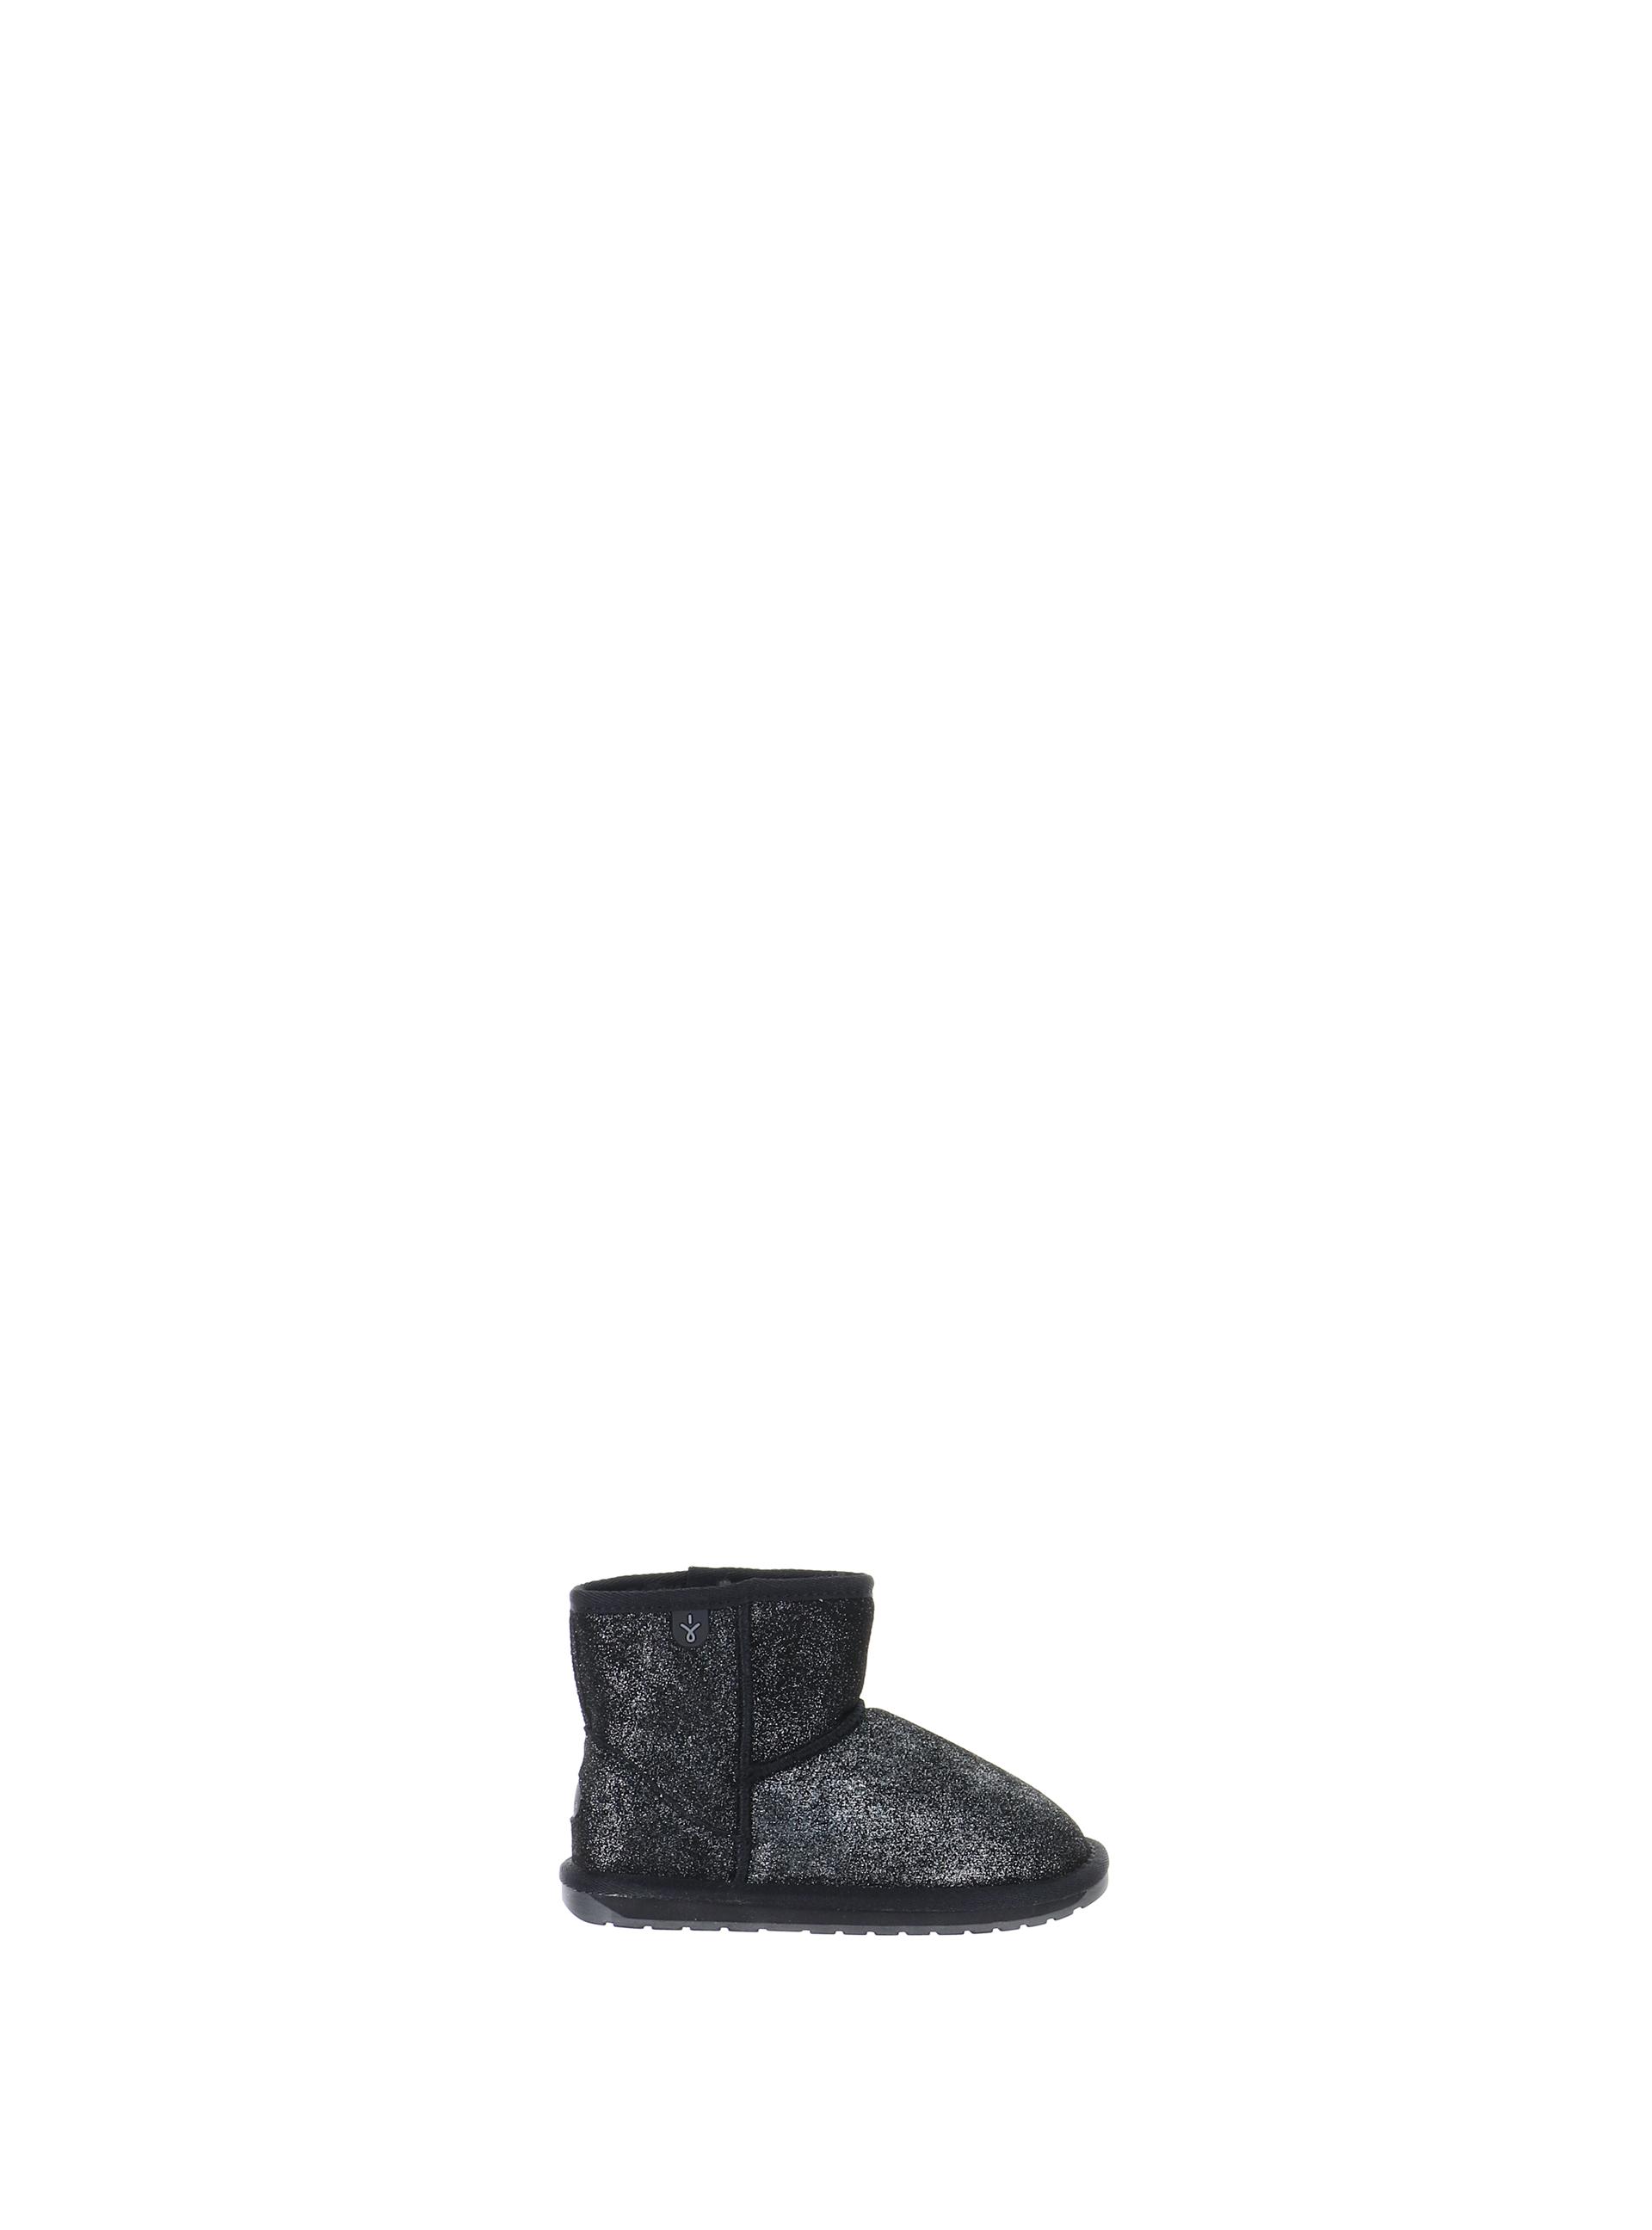 Emu wallaby mini -10% scarpe bambino nero  2367b839a49